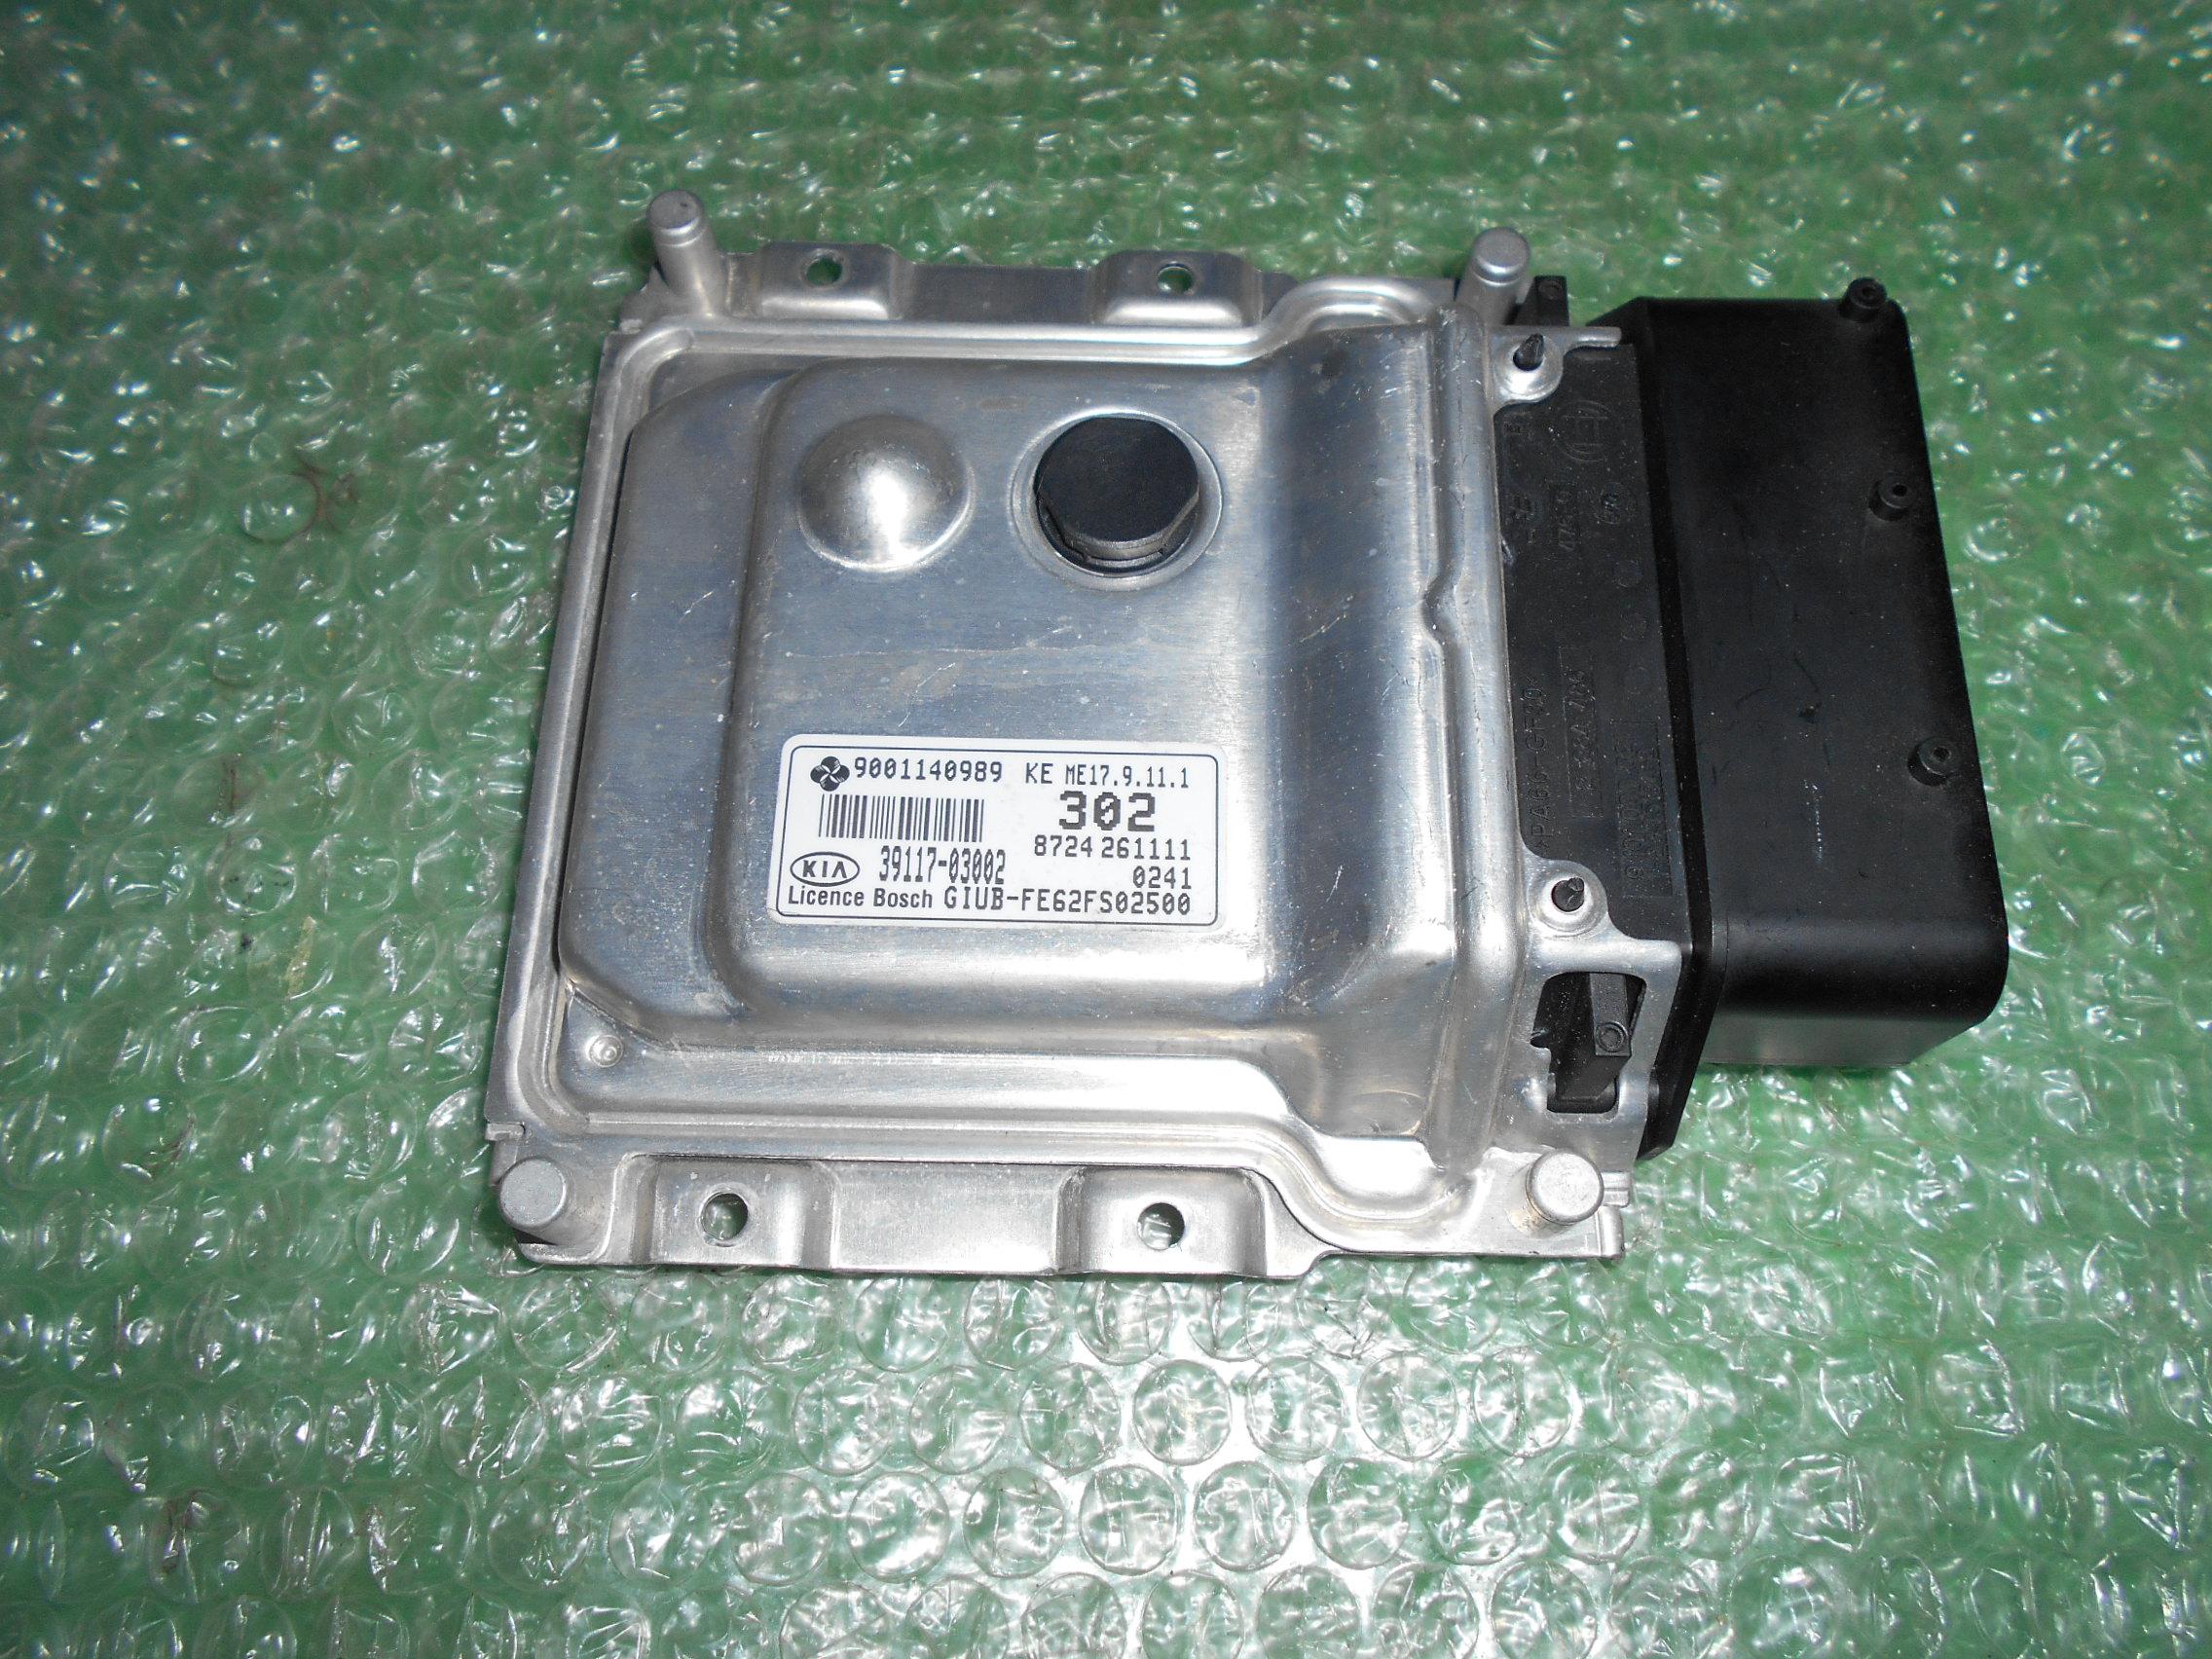 CENTRALITA UCE MOTOR 39117-03002 – 9001140989 KIA RIO III 1.2 16V (2012-2017)